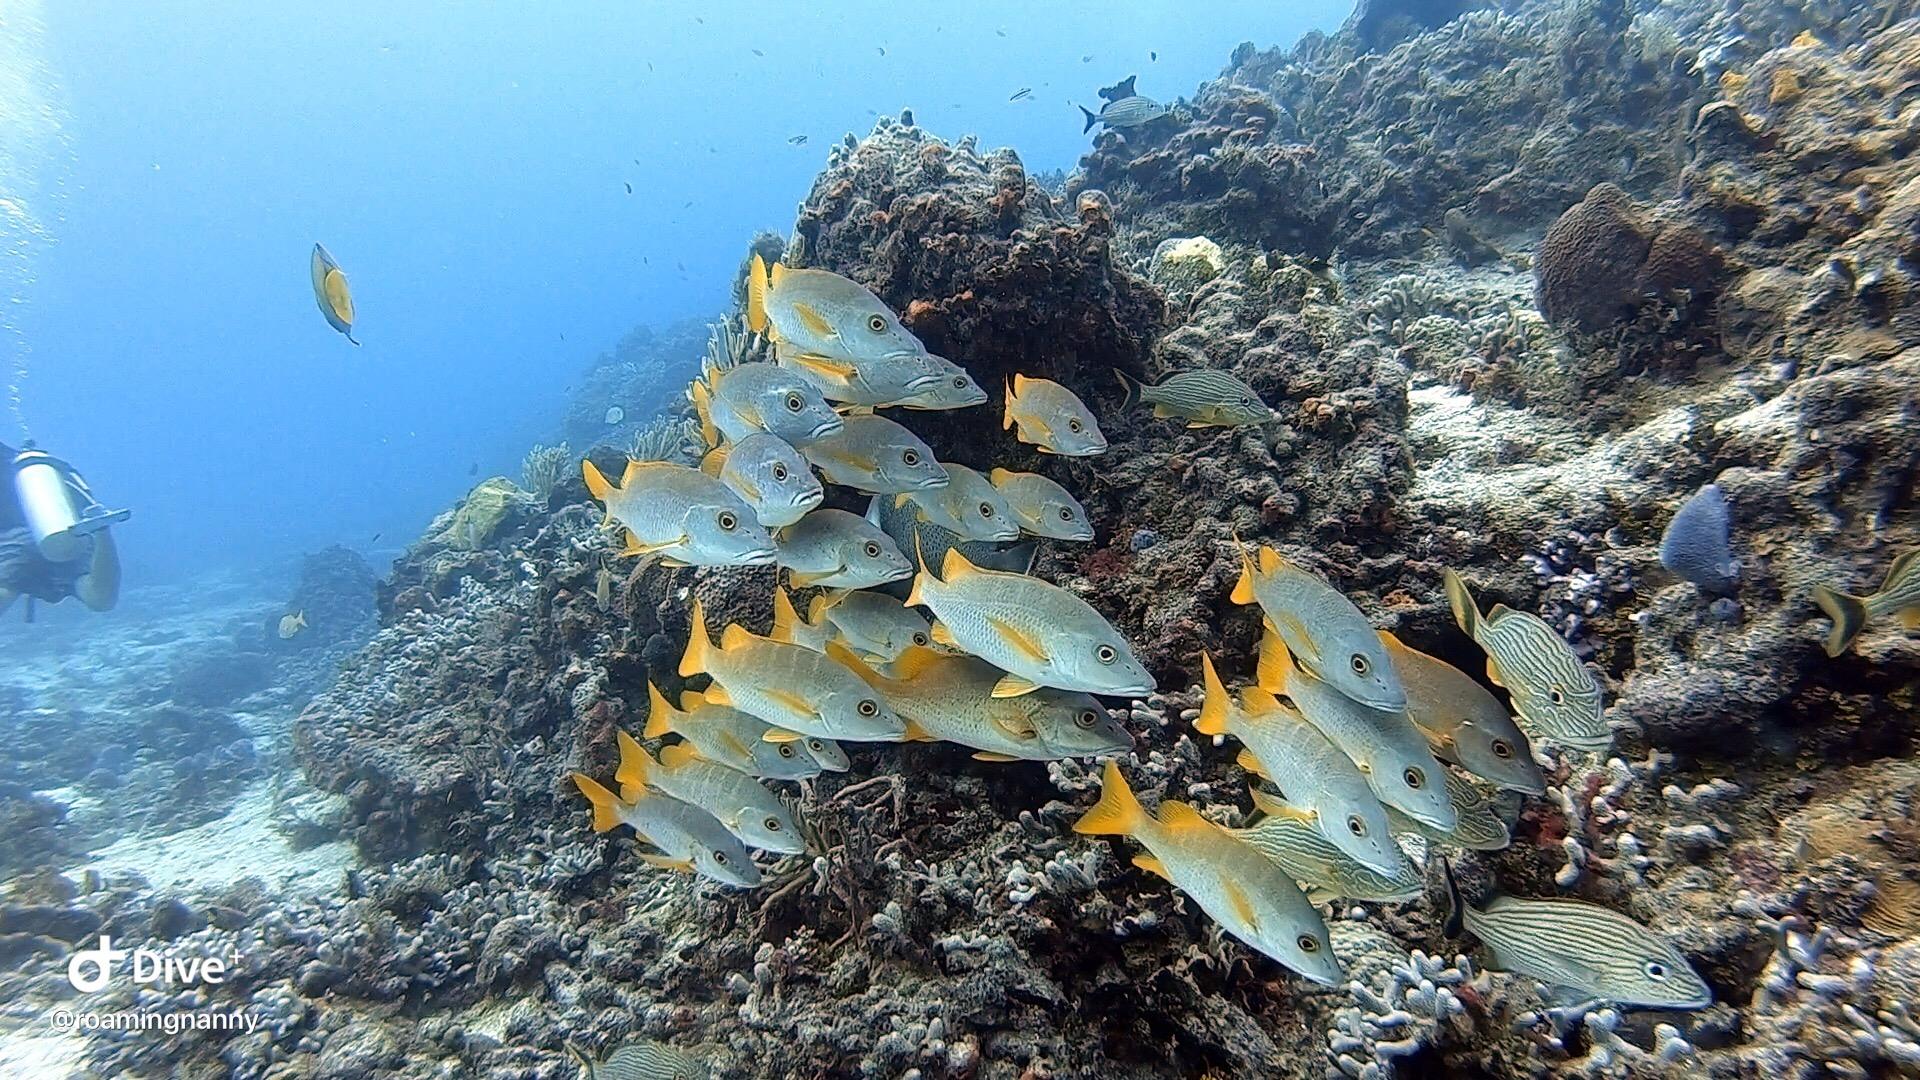 Scuba Diving FIsh